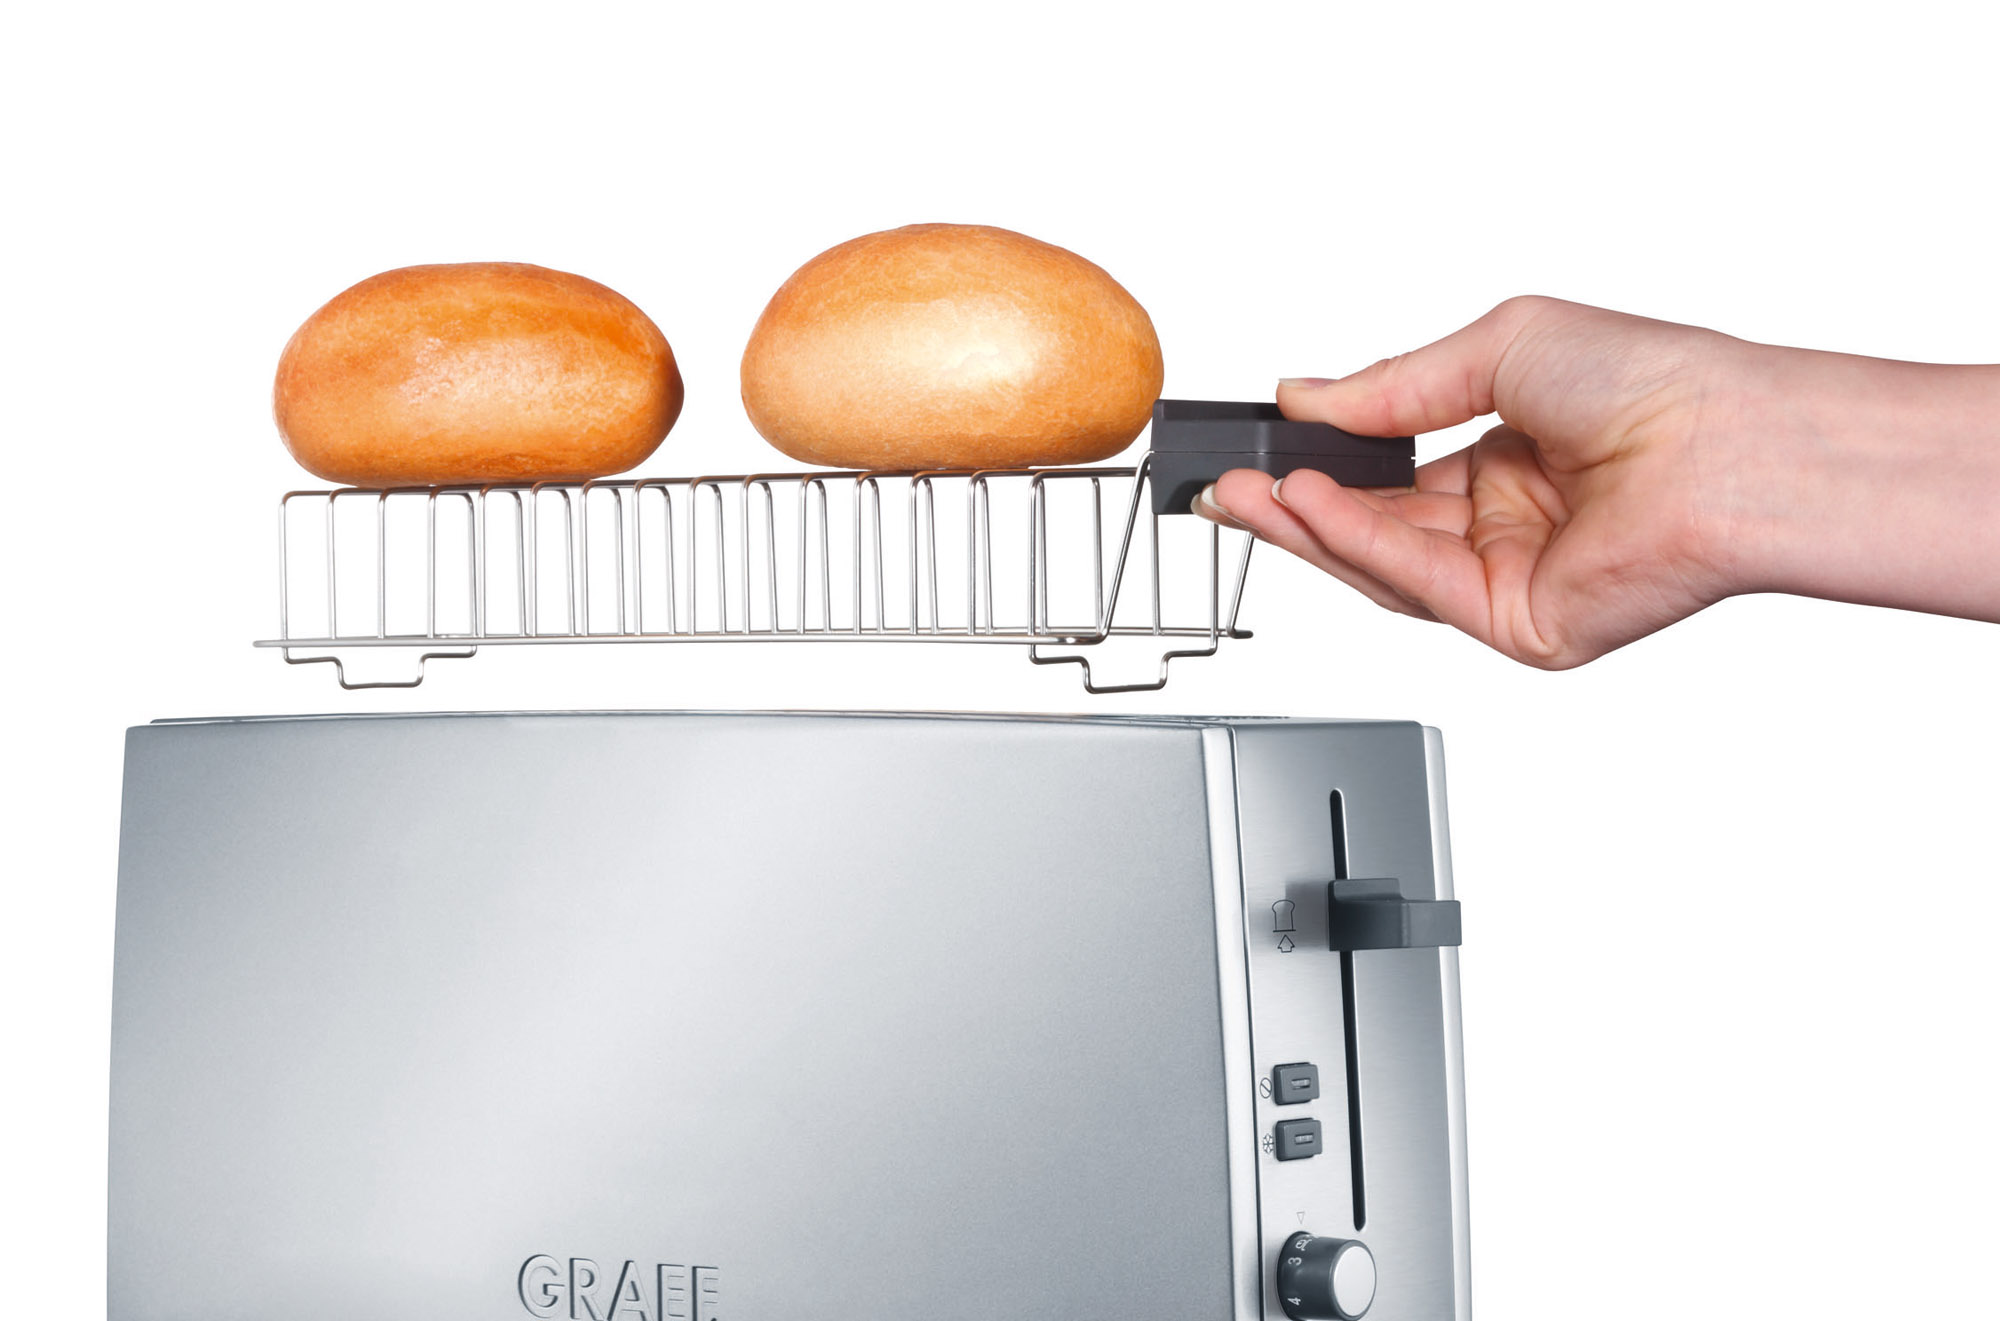 Graef TO90 kenyérpirító zsemletartó